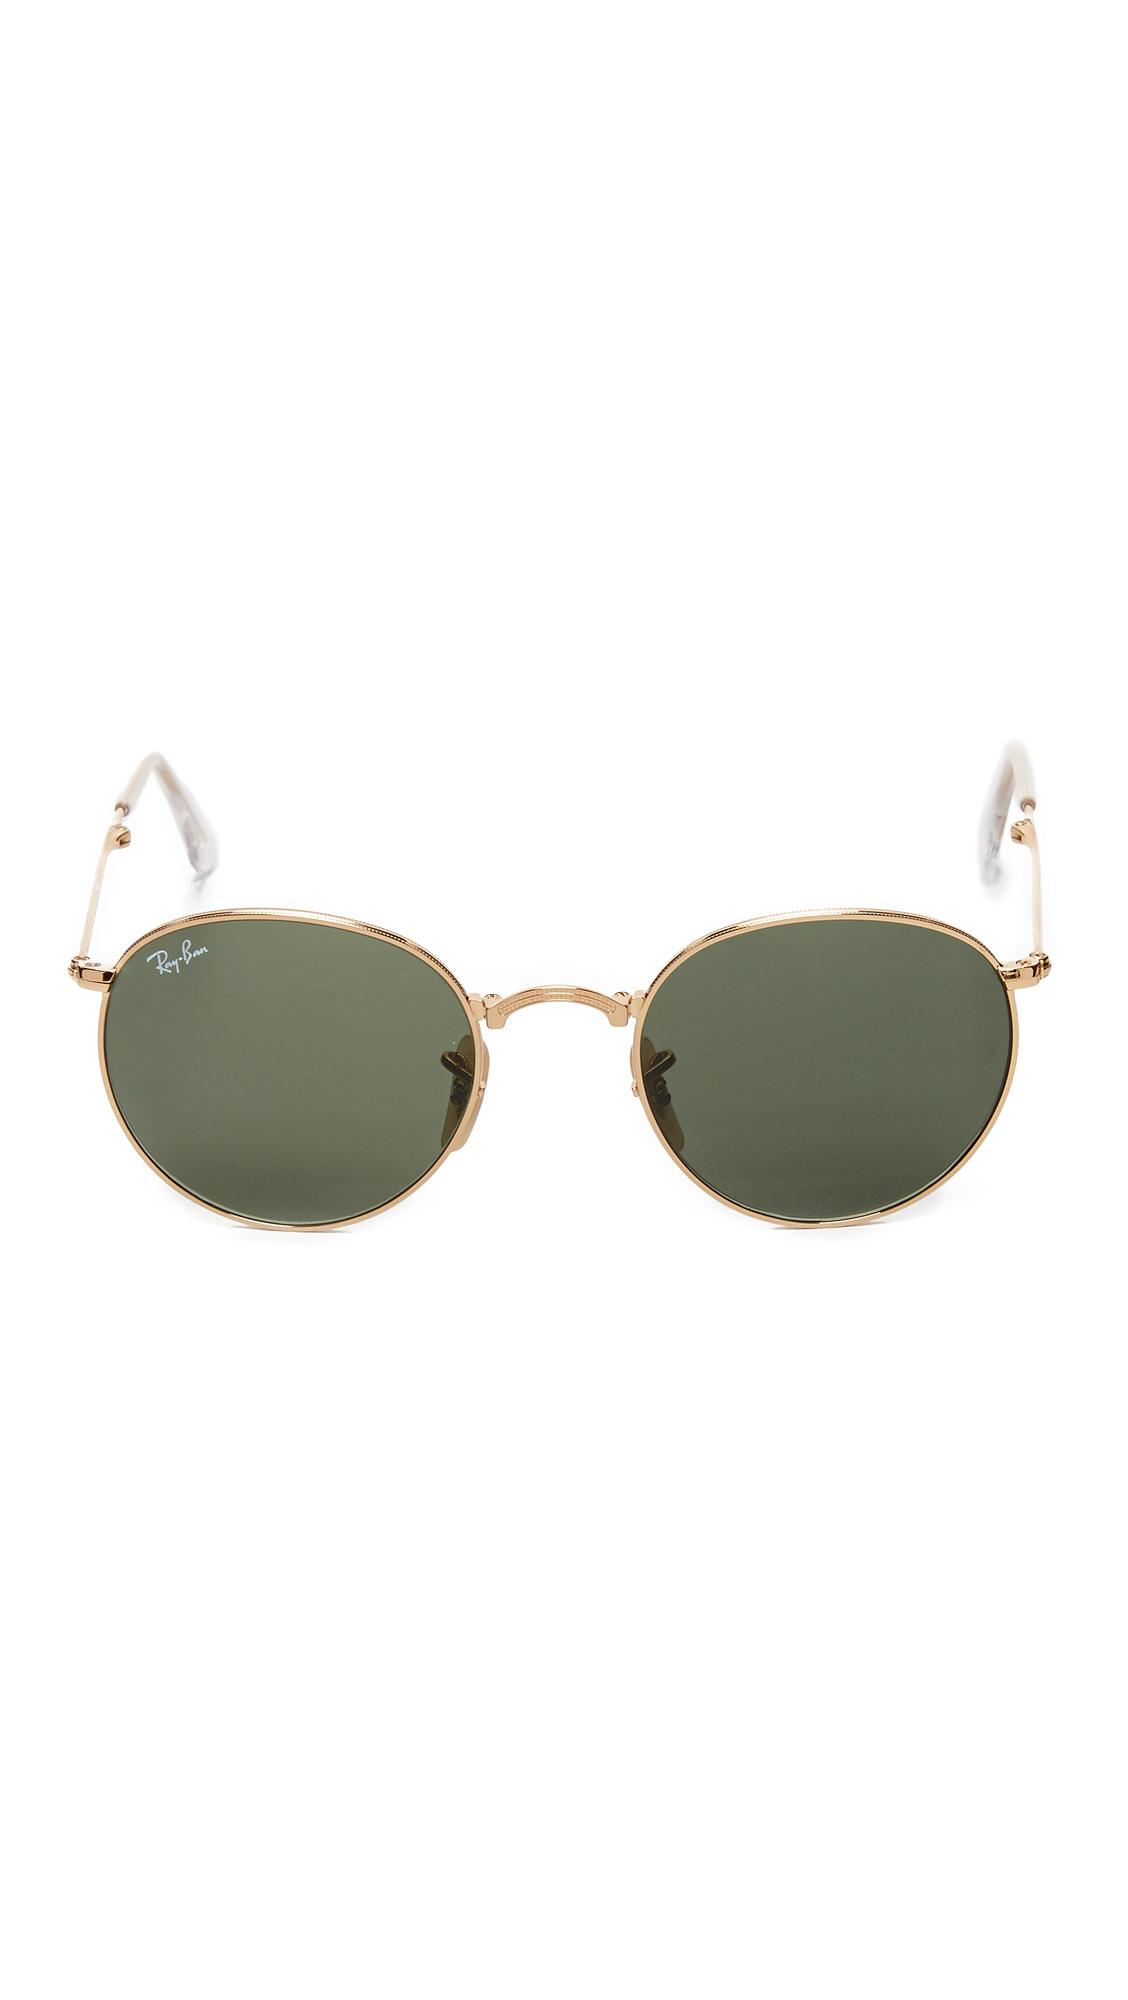 Ray-Ban Icons Round Sunglasses | SHOPBOP